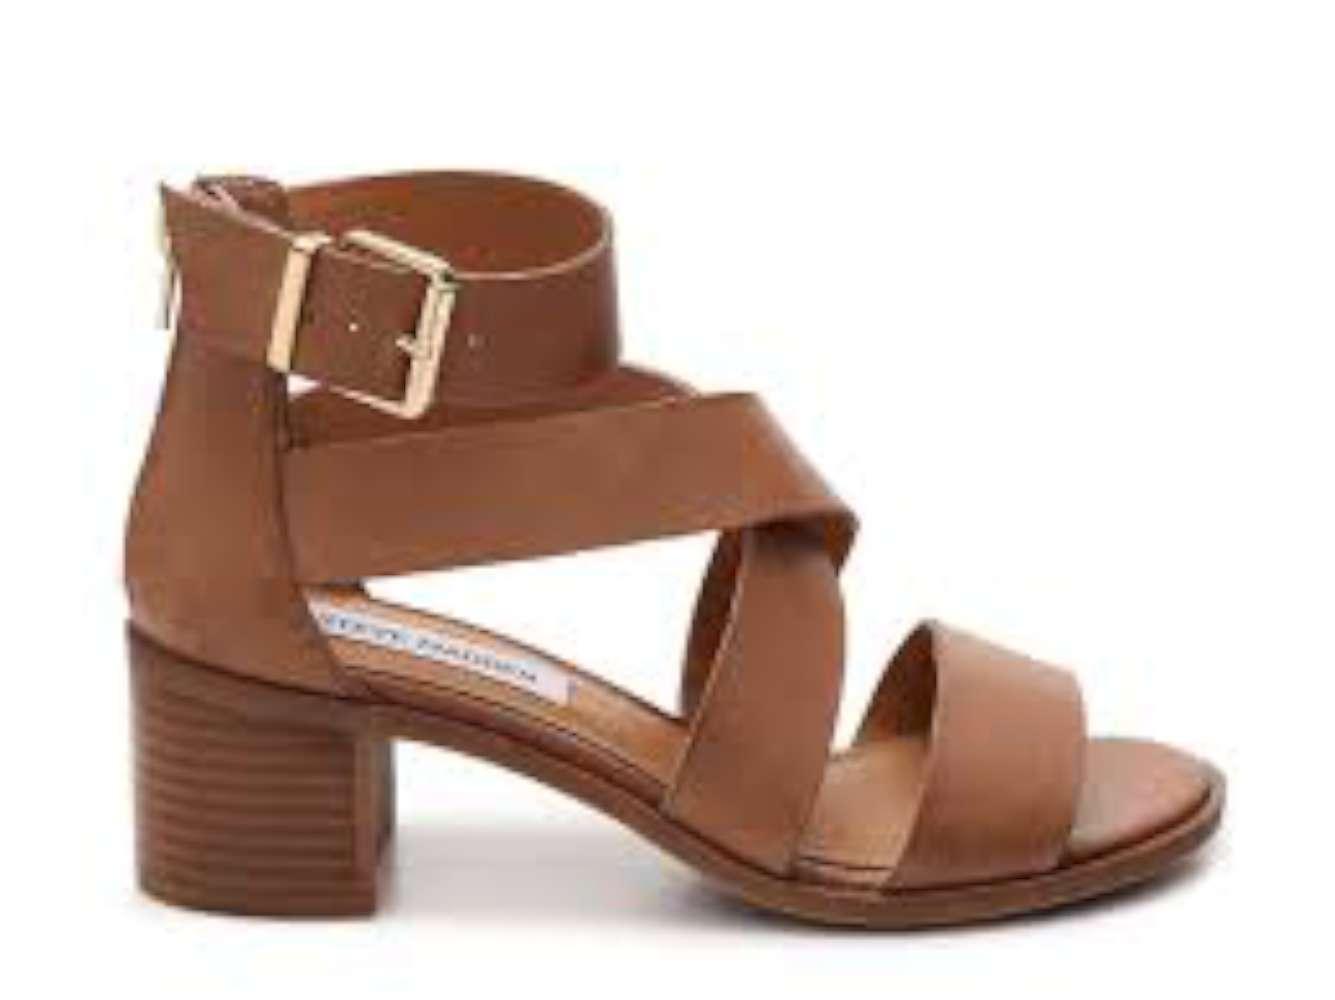 d1581ebbd83 Steve Madden Raeleen Womens Heeled Sandals Cognac 6 US   4 UK 1i ...